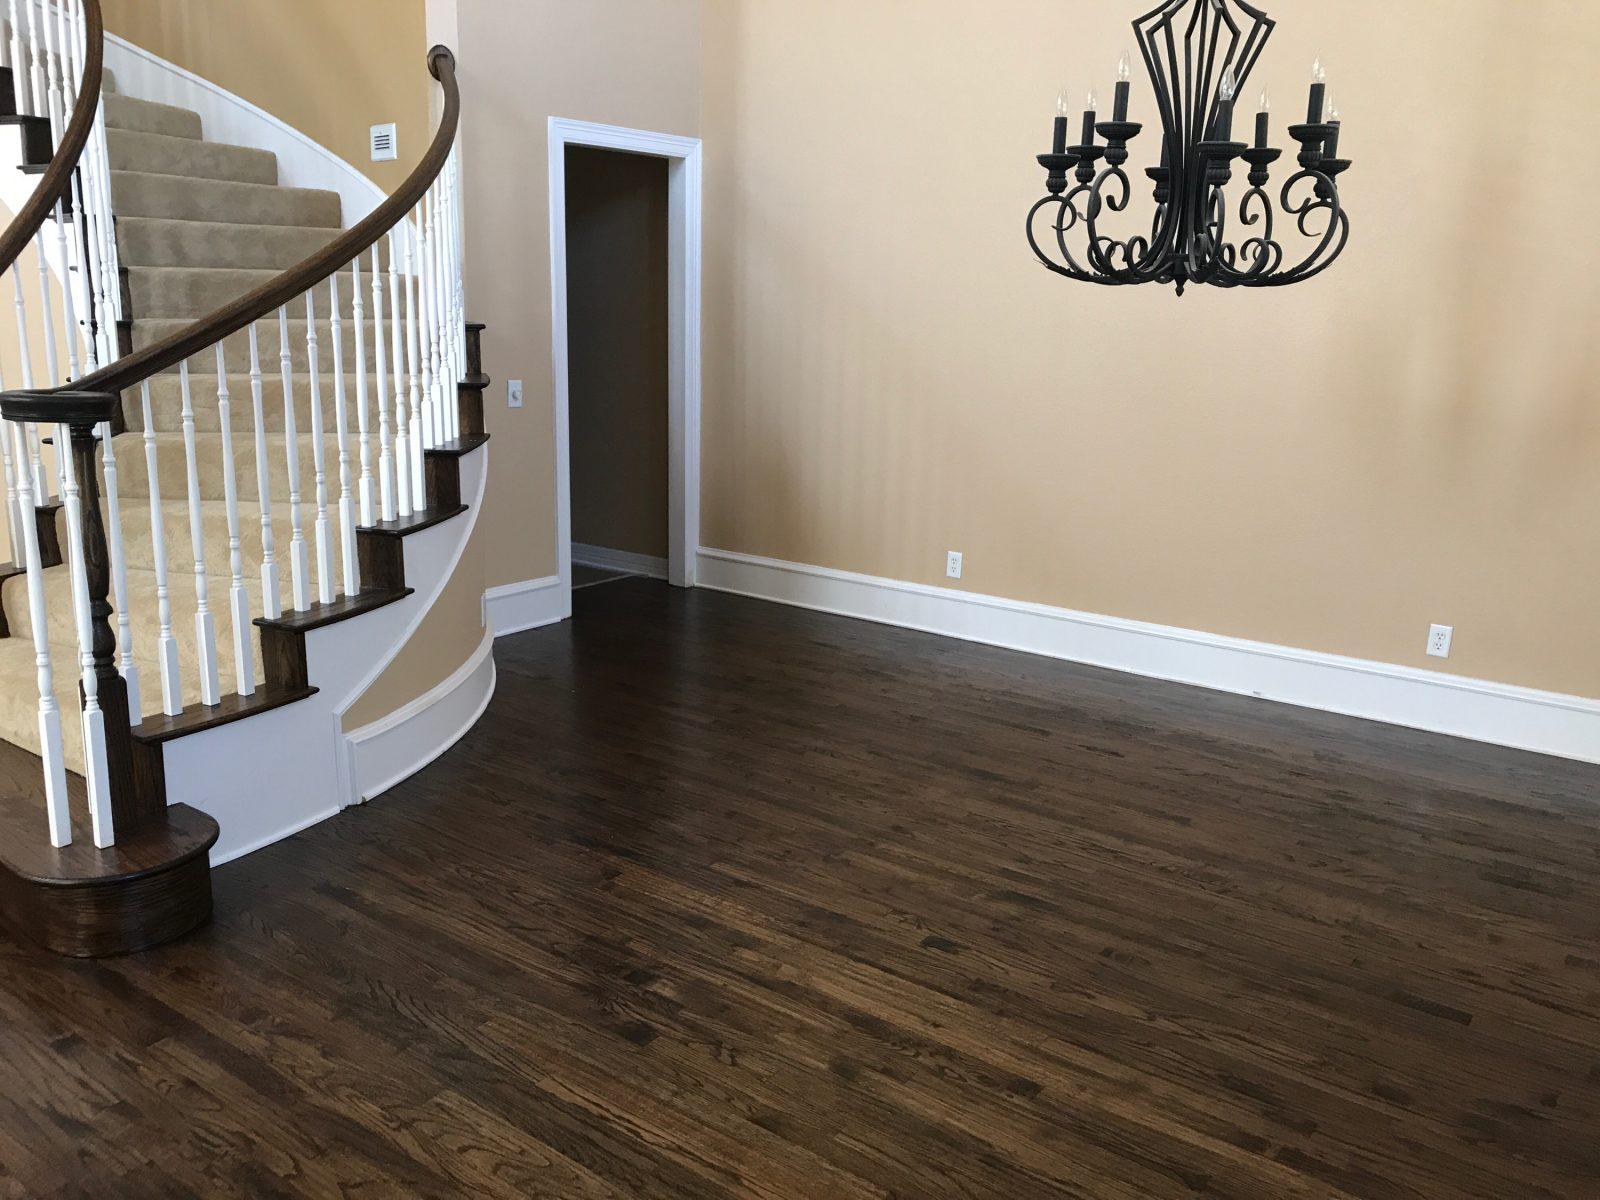 Solid Wood Floors In Flower Mound Texas Gc Flooring Pros